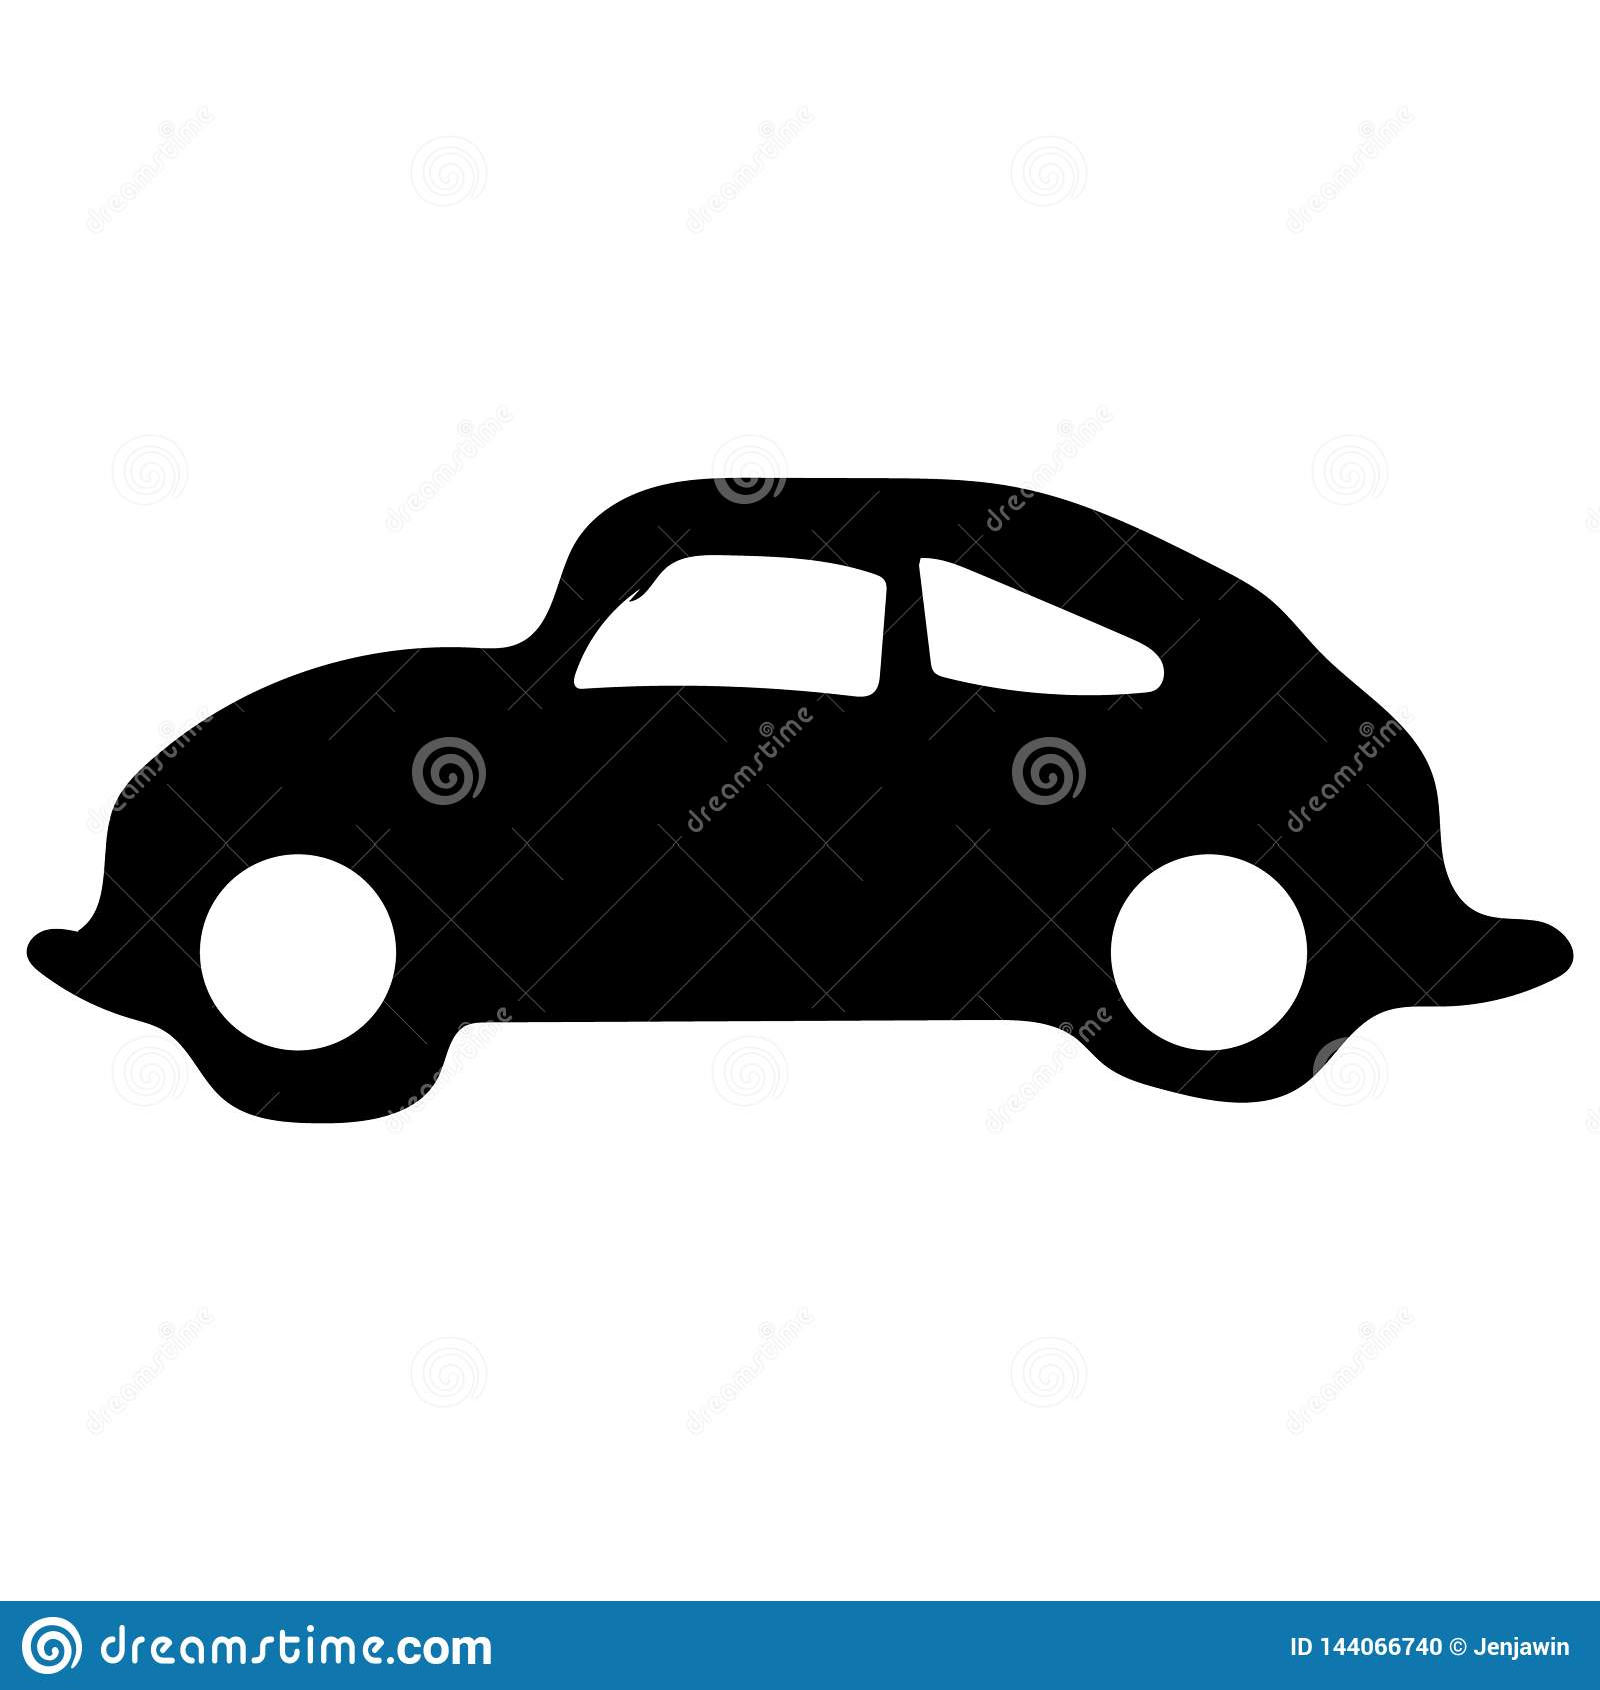 Retro car icon vector eps10. Old retro classic car black color sign